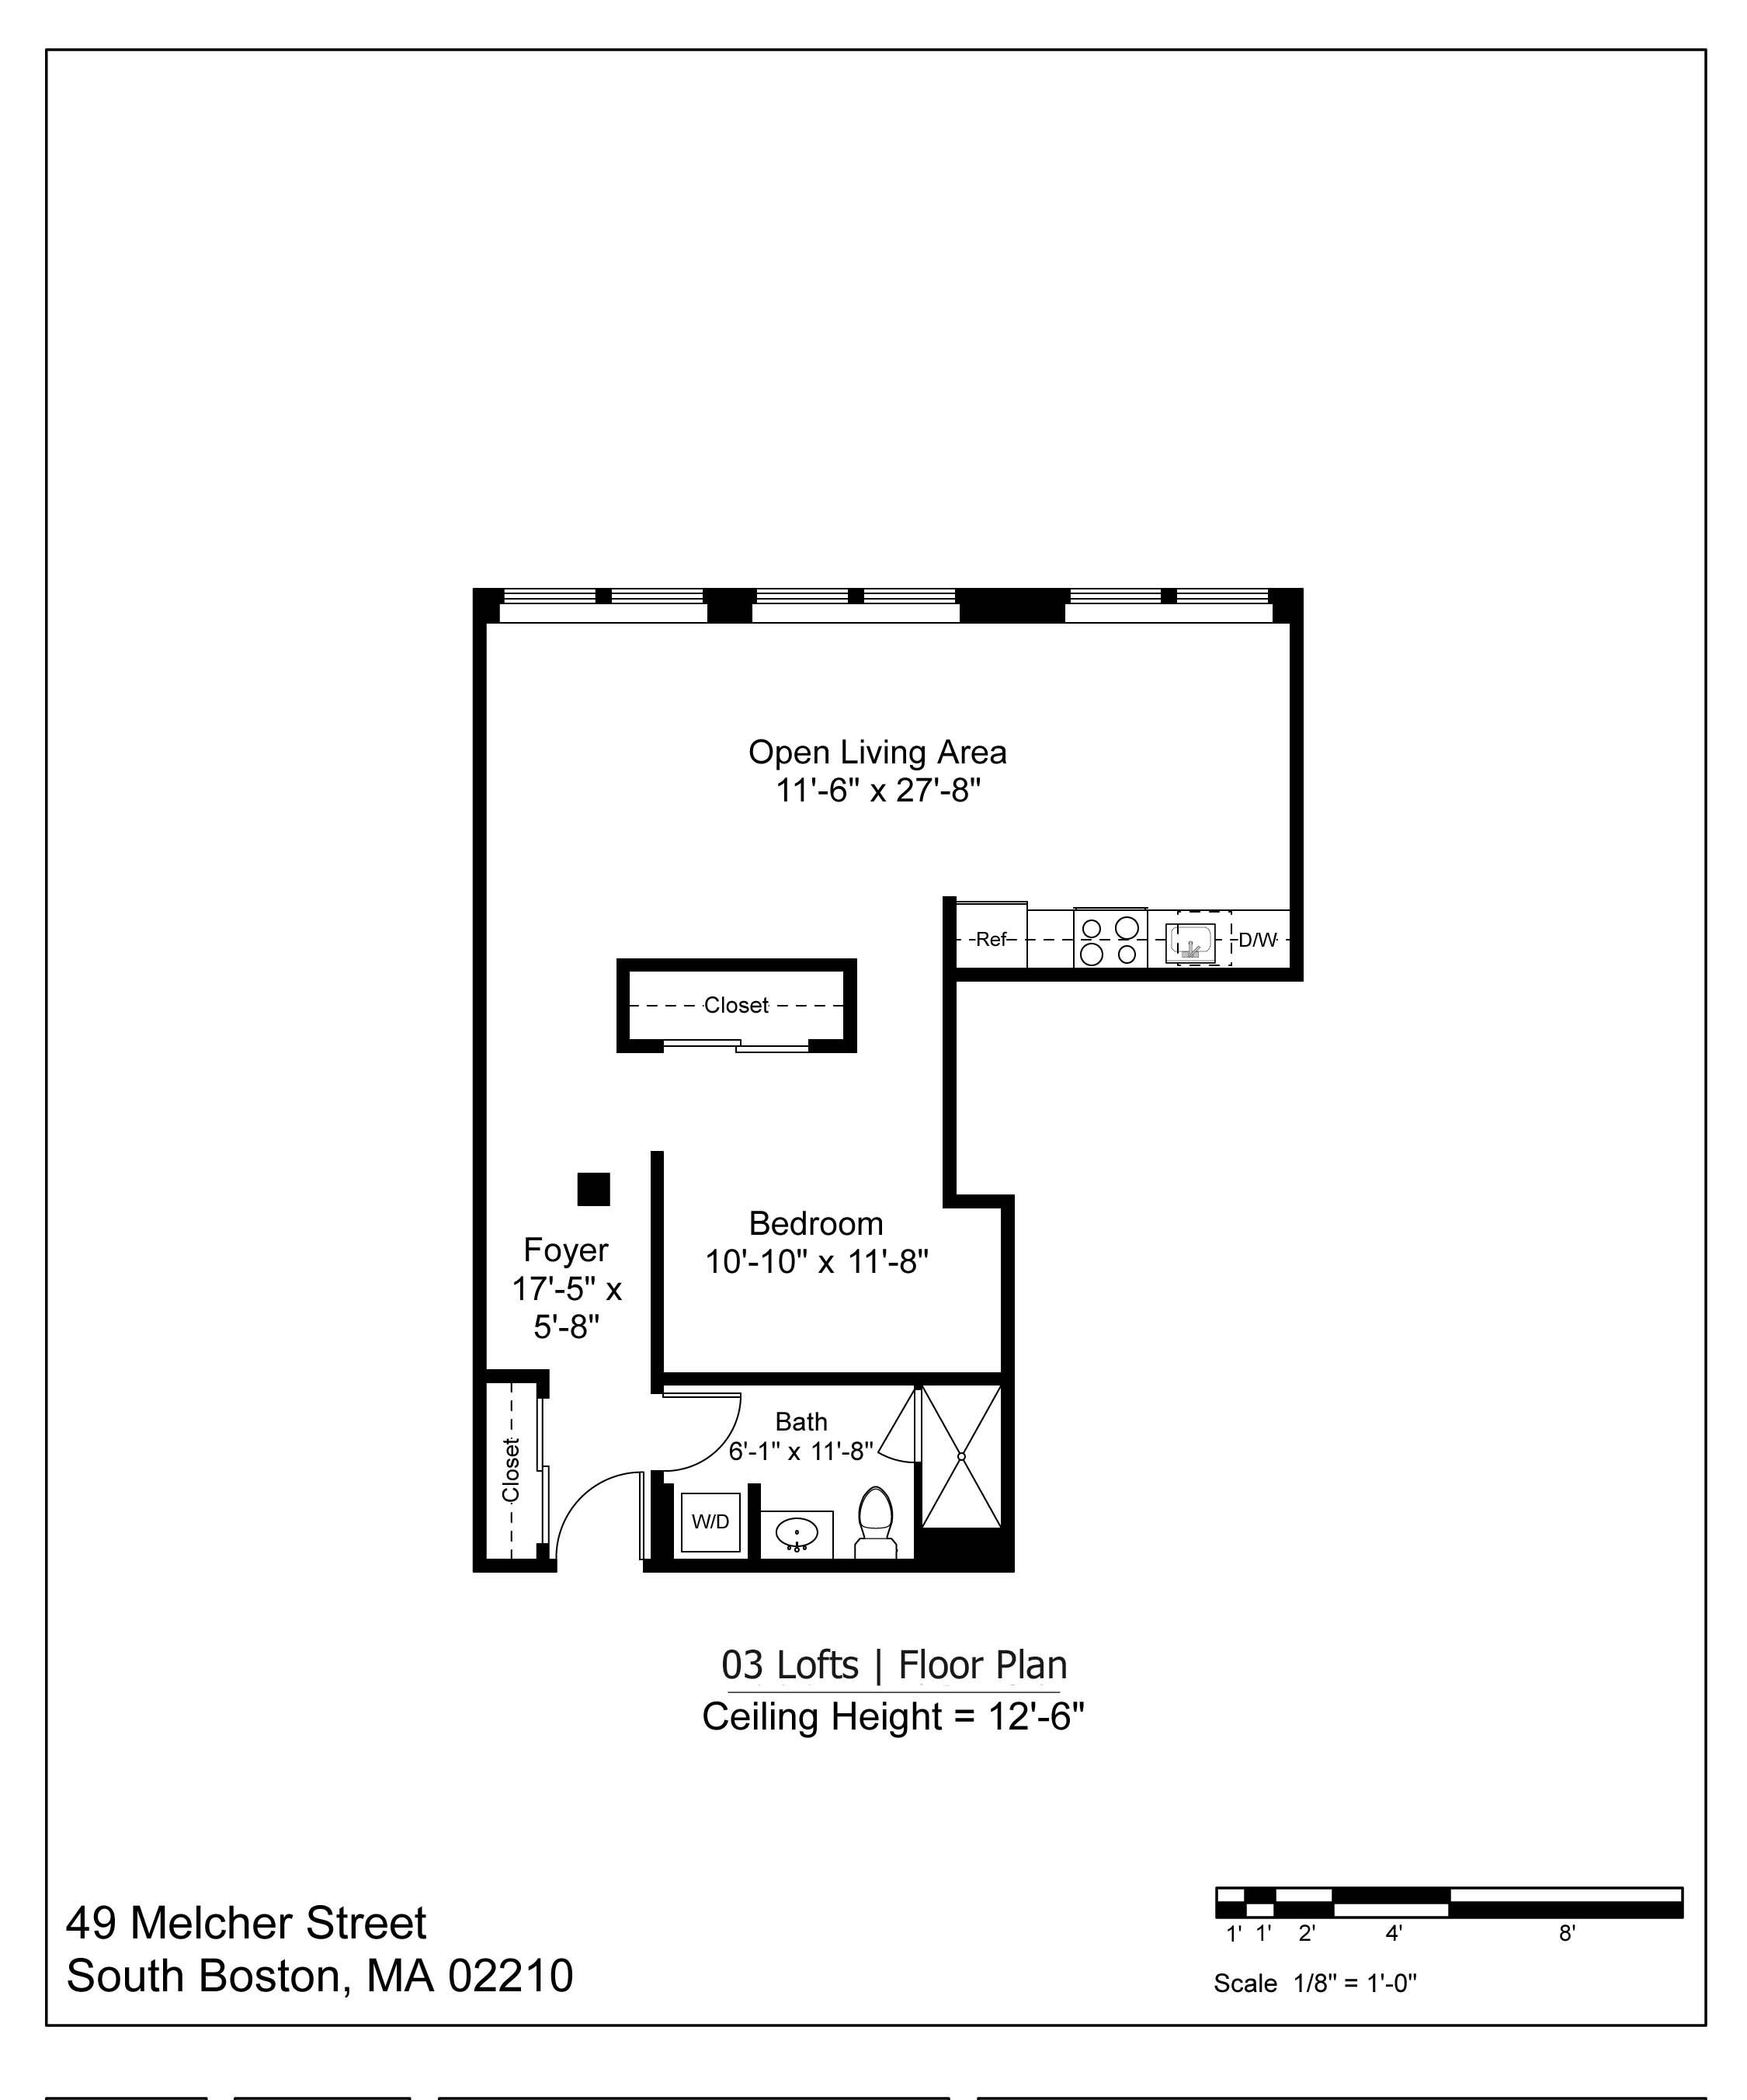 03 LOFT FLOOR PLAN - 871 SF   $2900-3250/MONTH